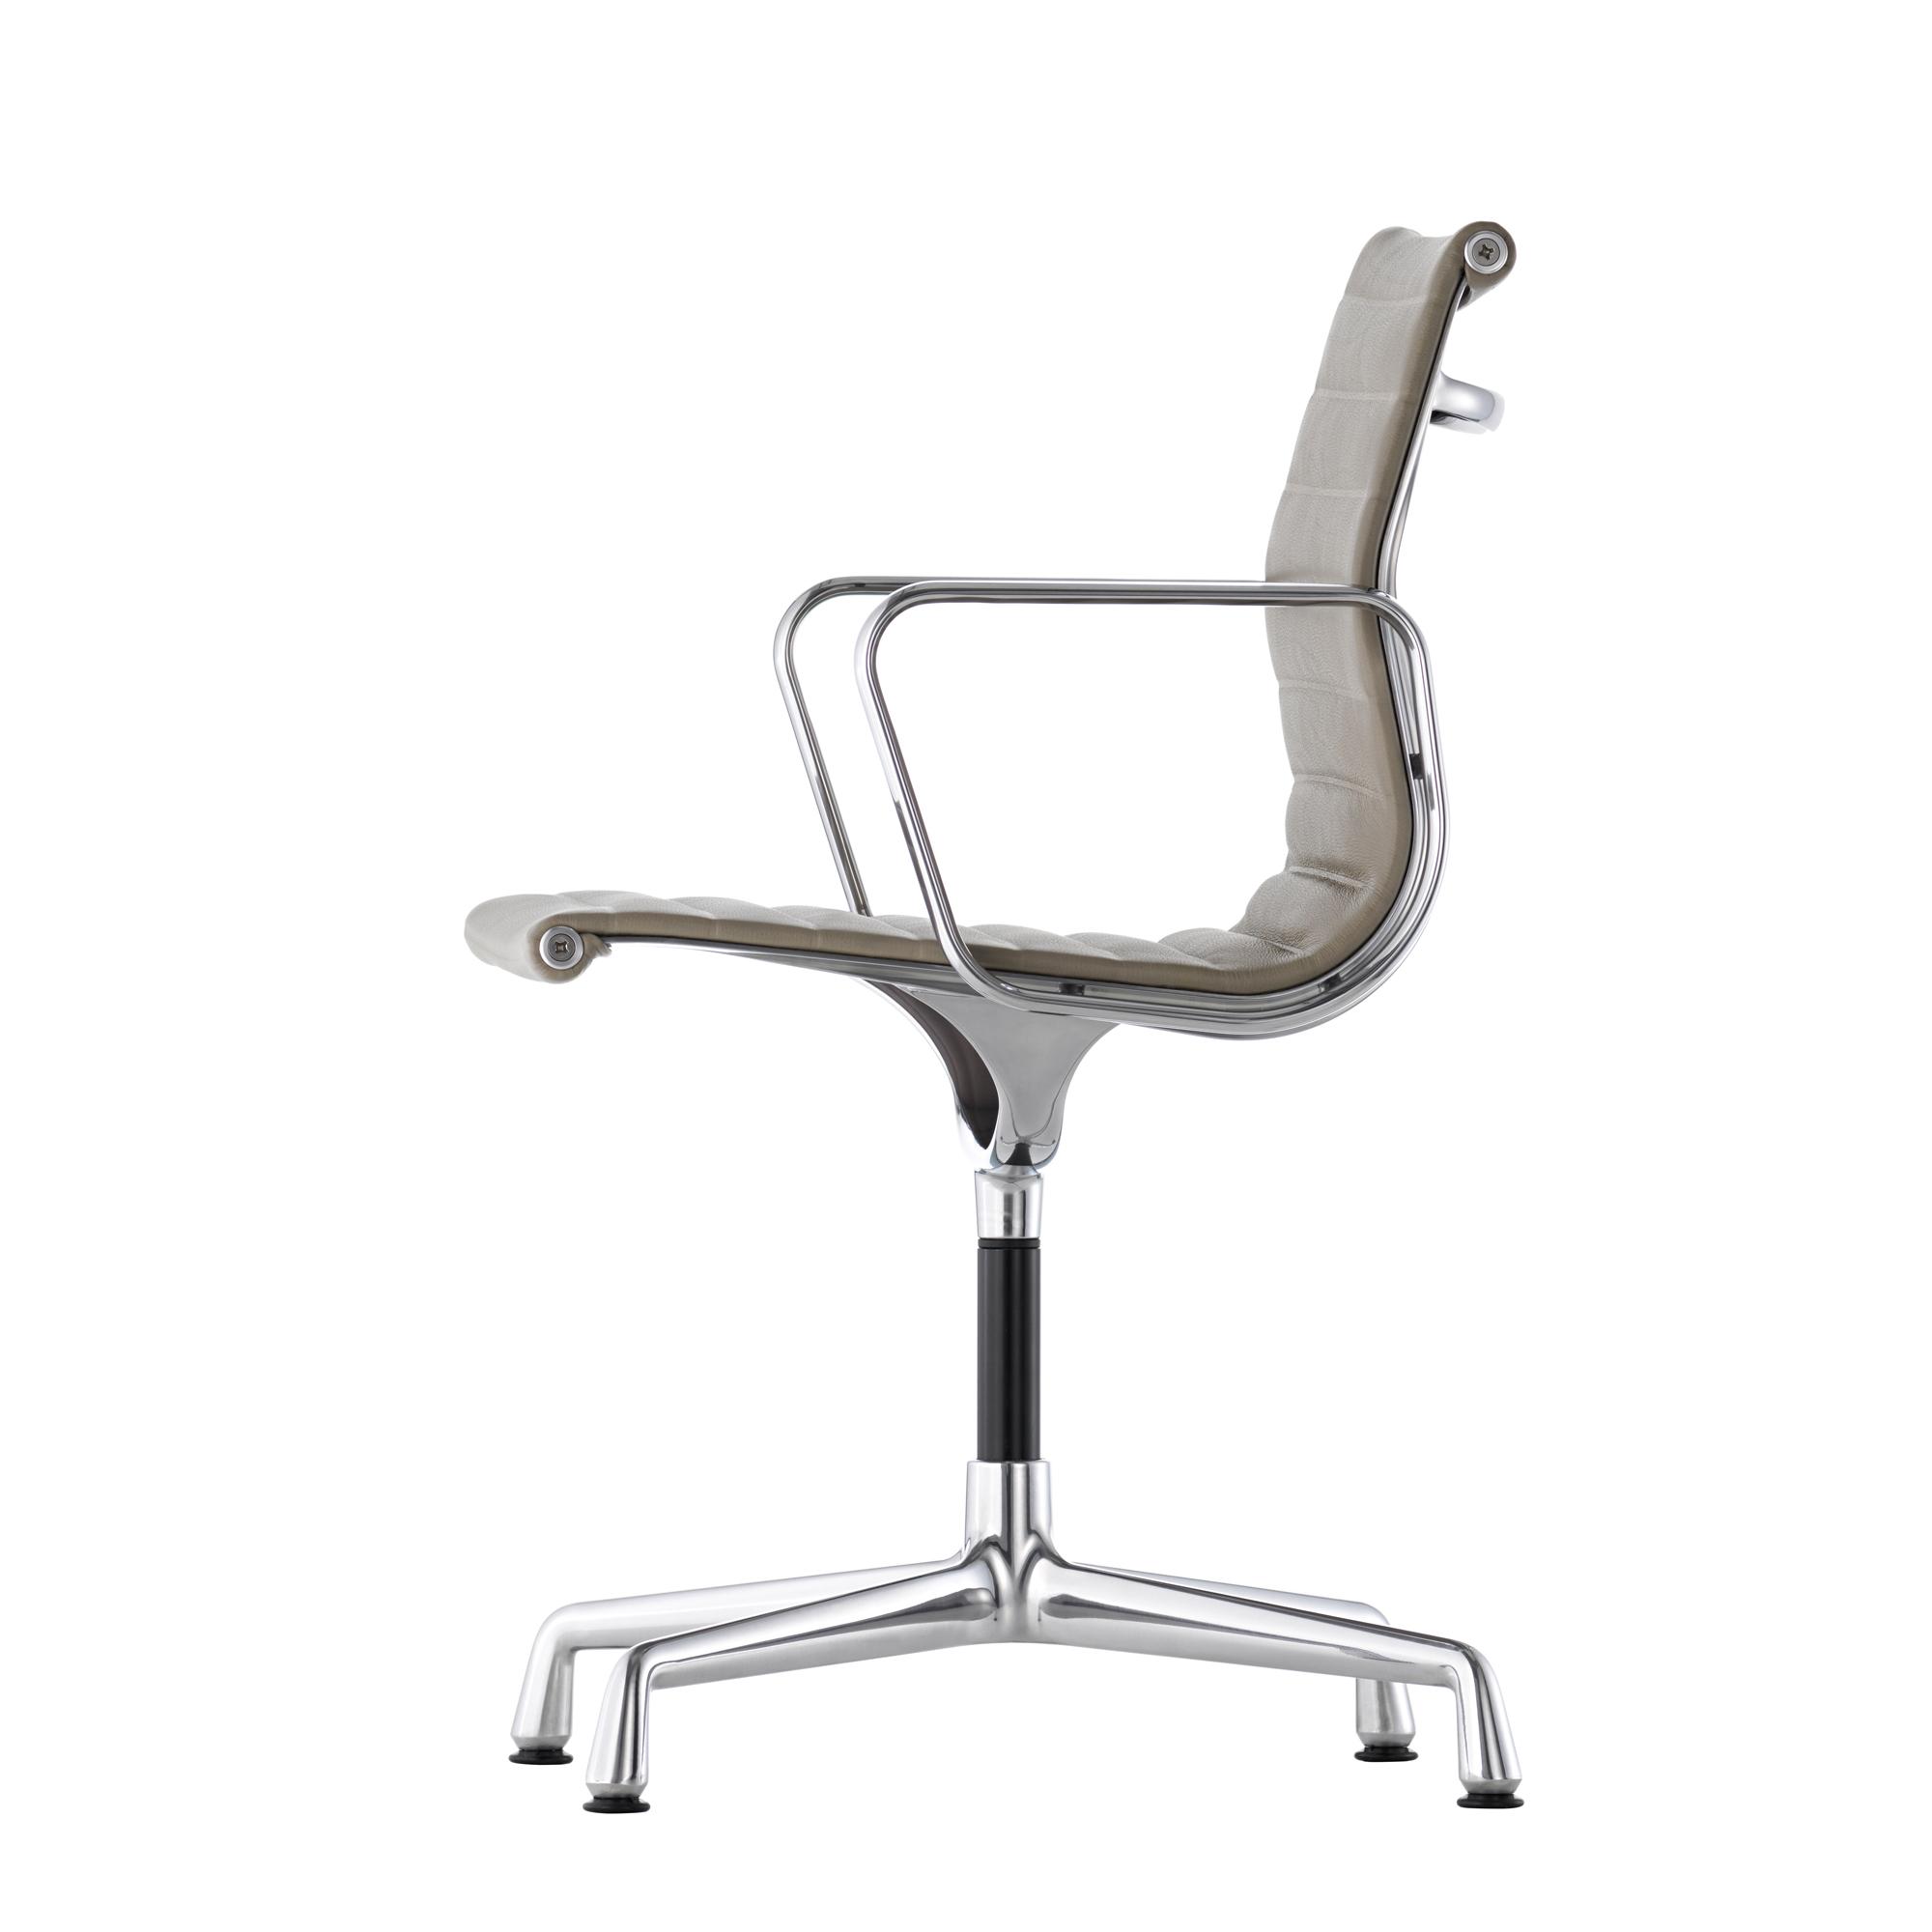 Vitra Stuhl Aluminium Chair Ea 103 In Netzgewebe Stoff Oder Leder Designikonen Designmobel Shop